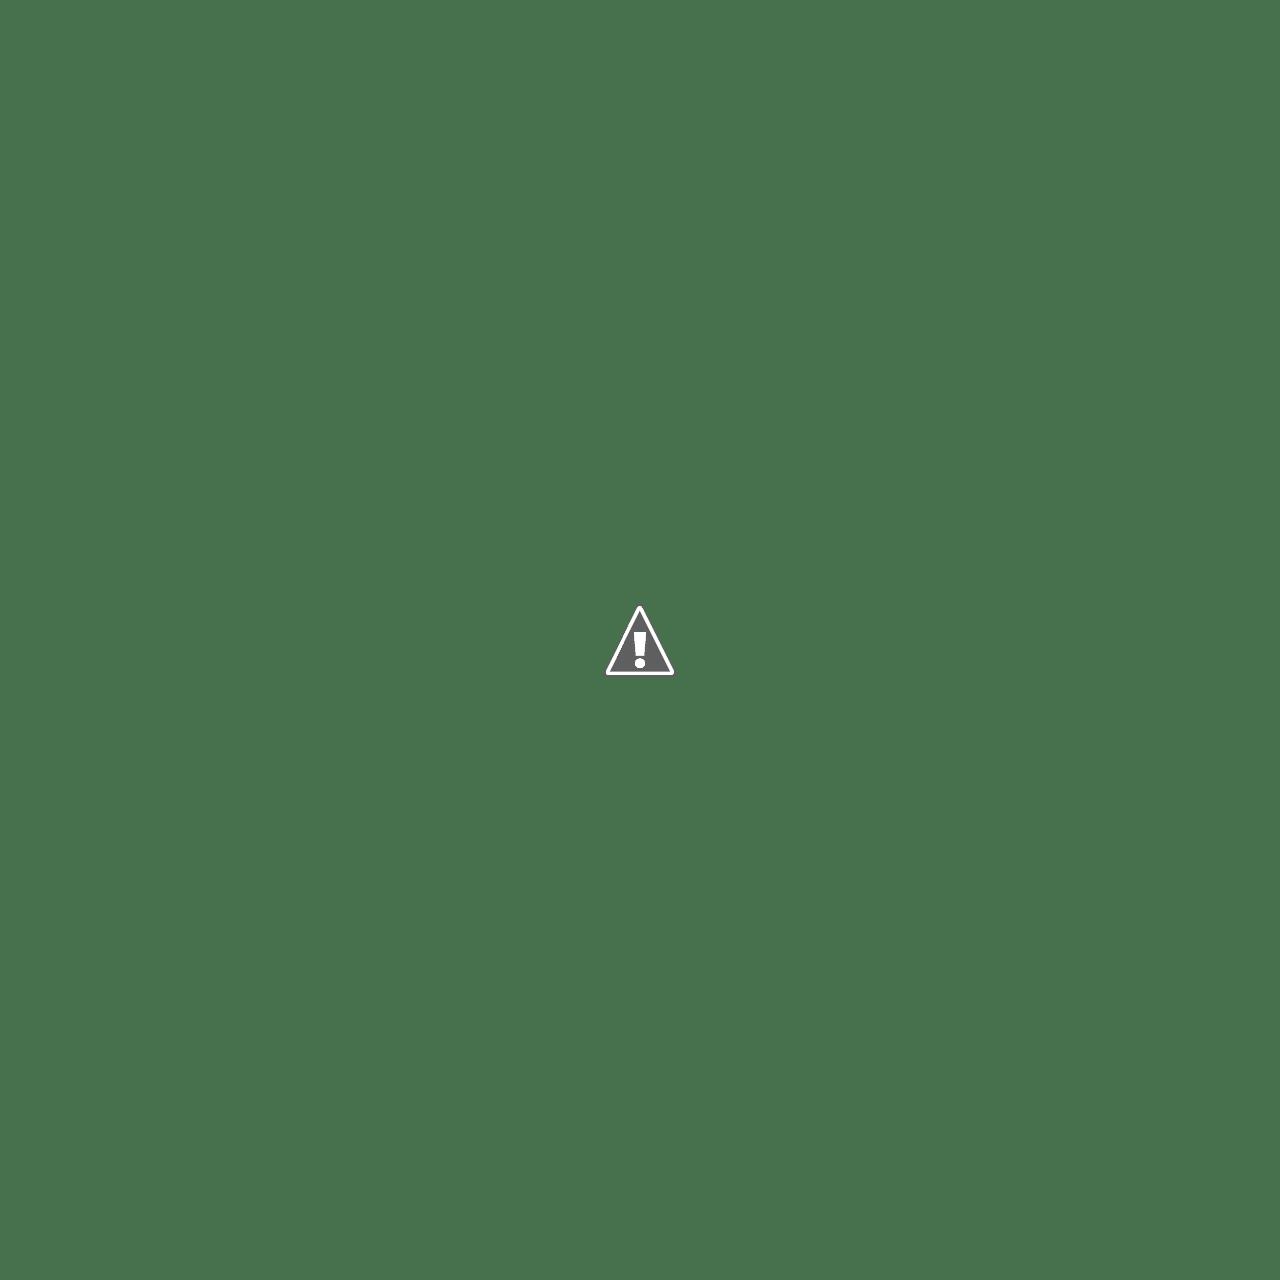 MR COMMUNICATION : SUN DTH, Airtel, Tata Sky, Videocon, Dish